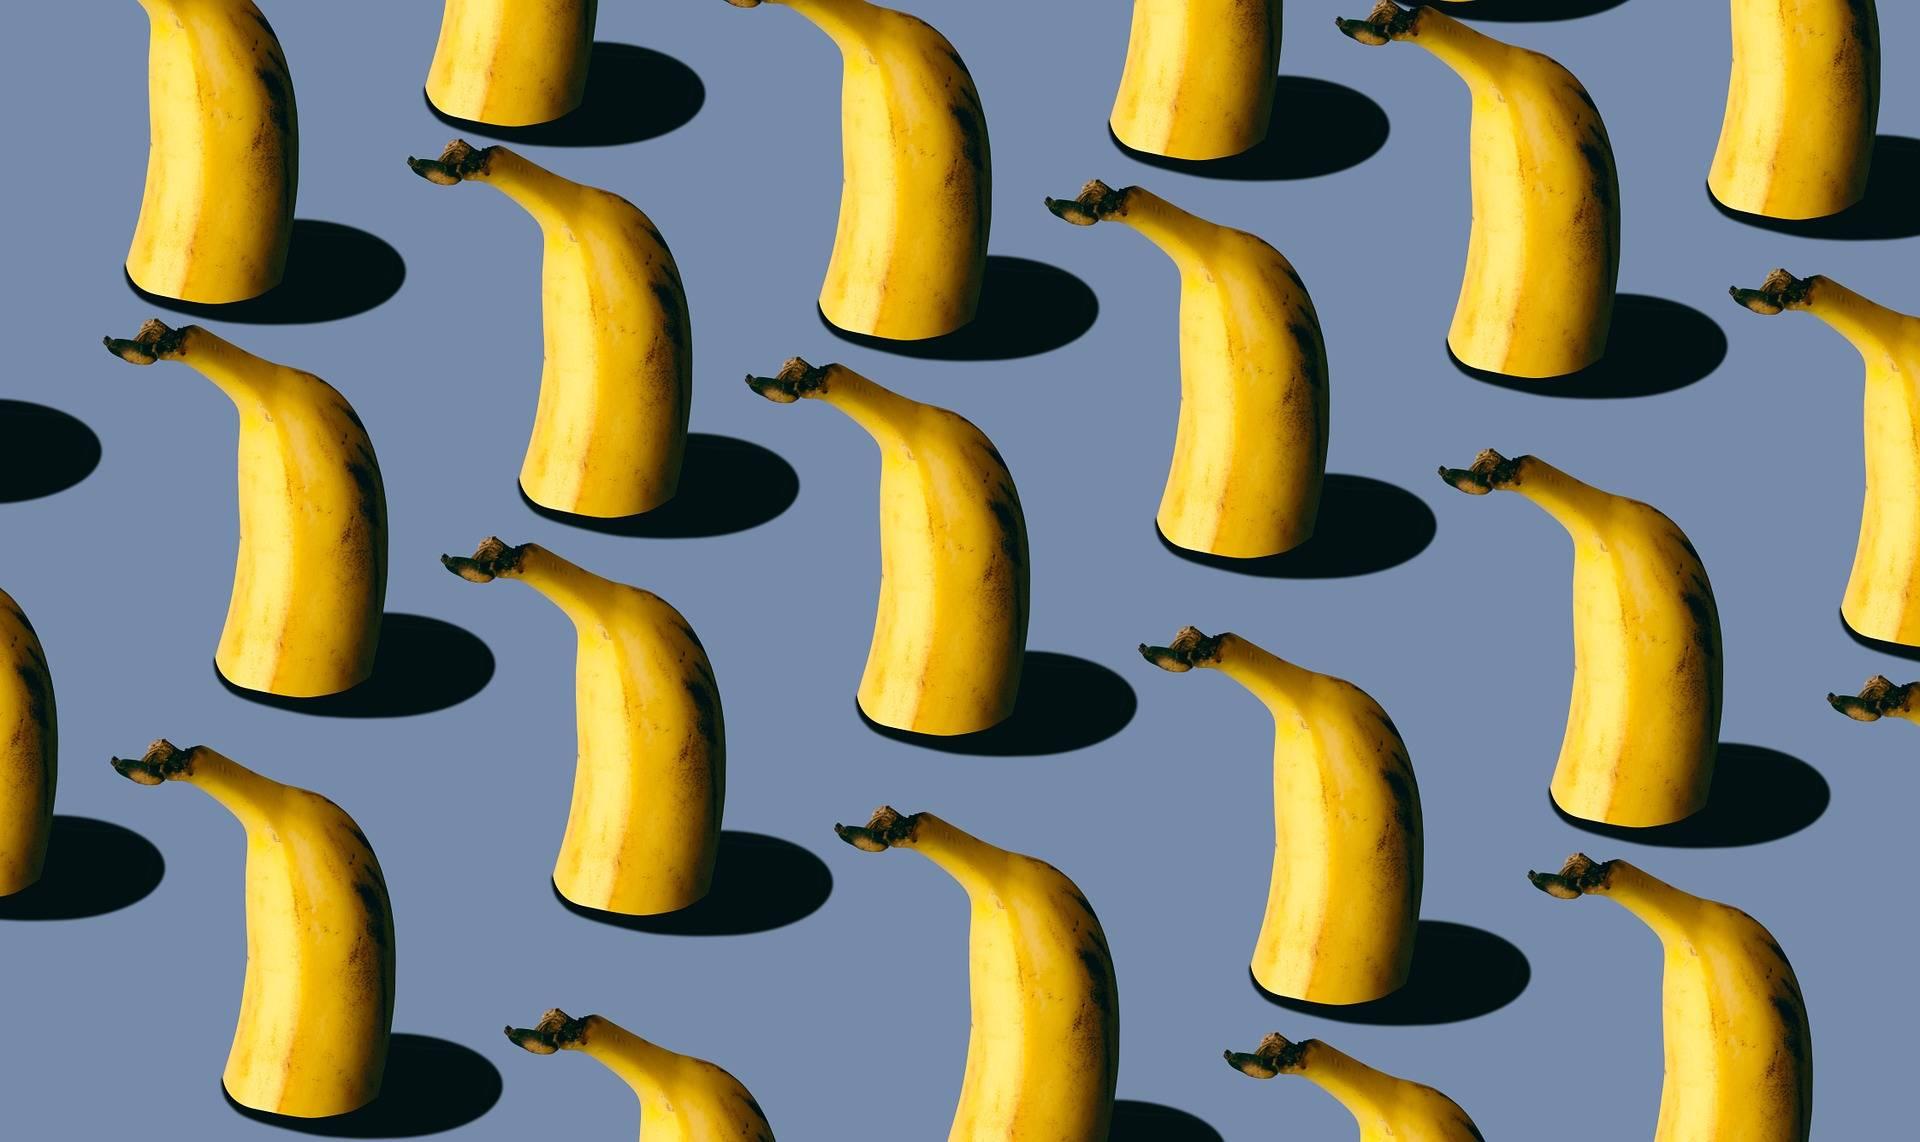 banane-copie-serie